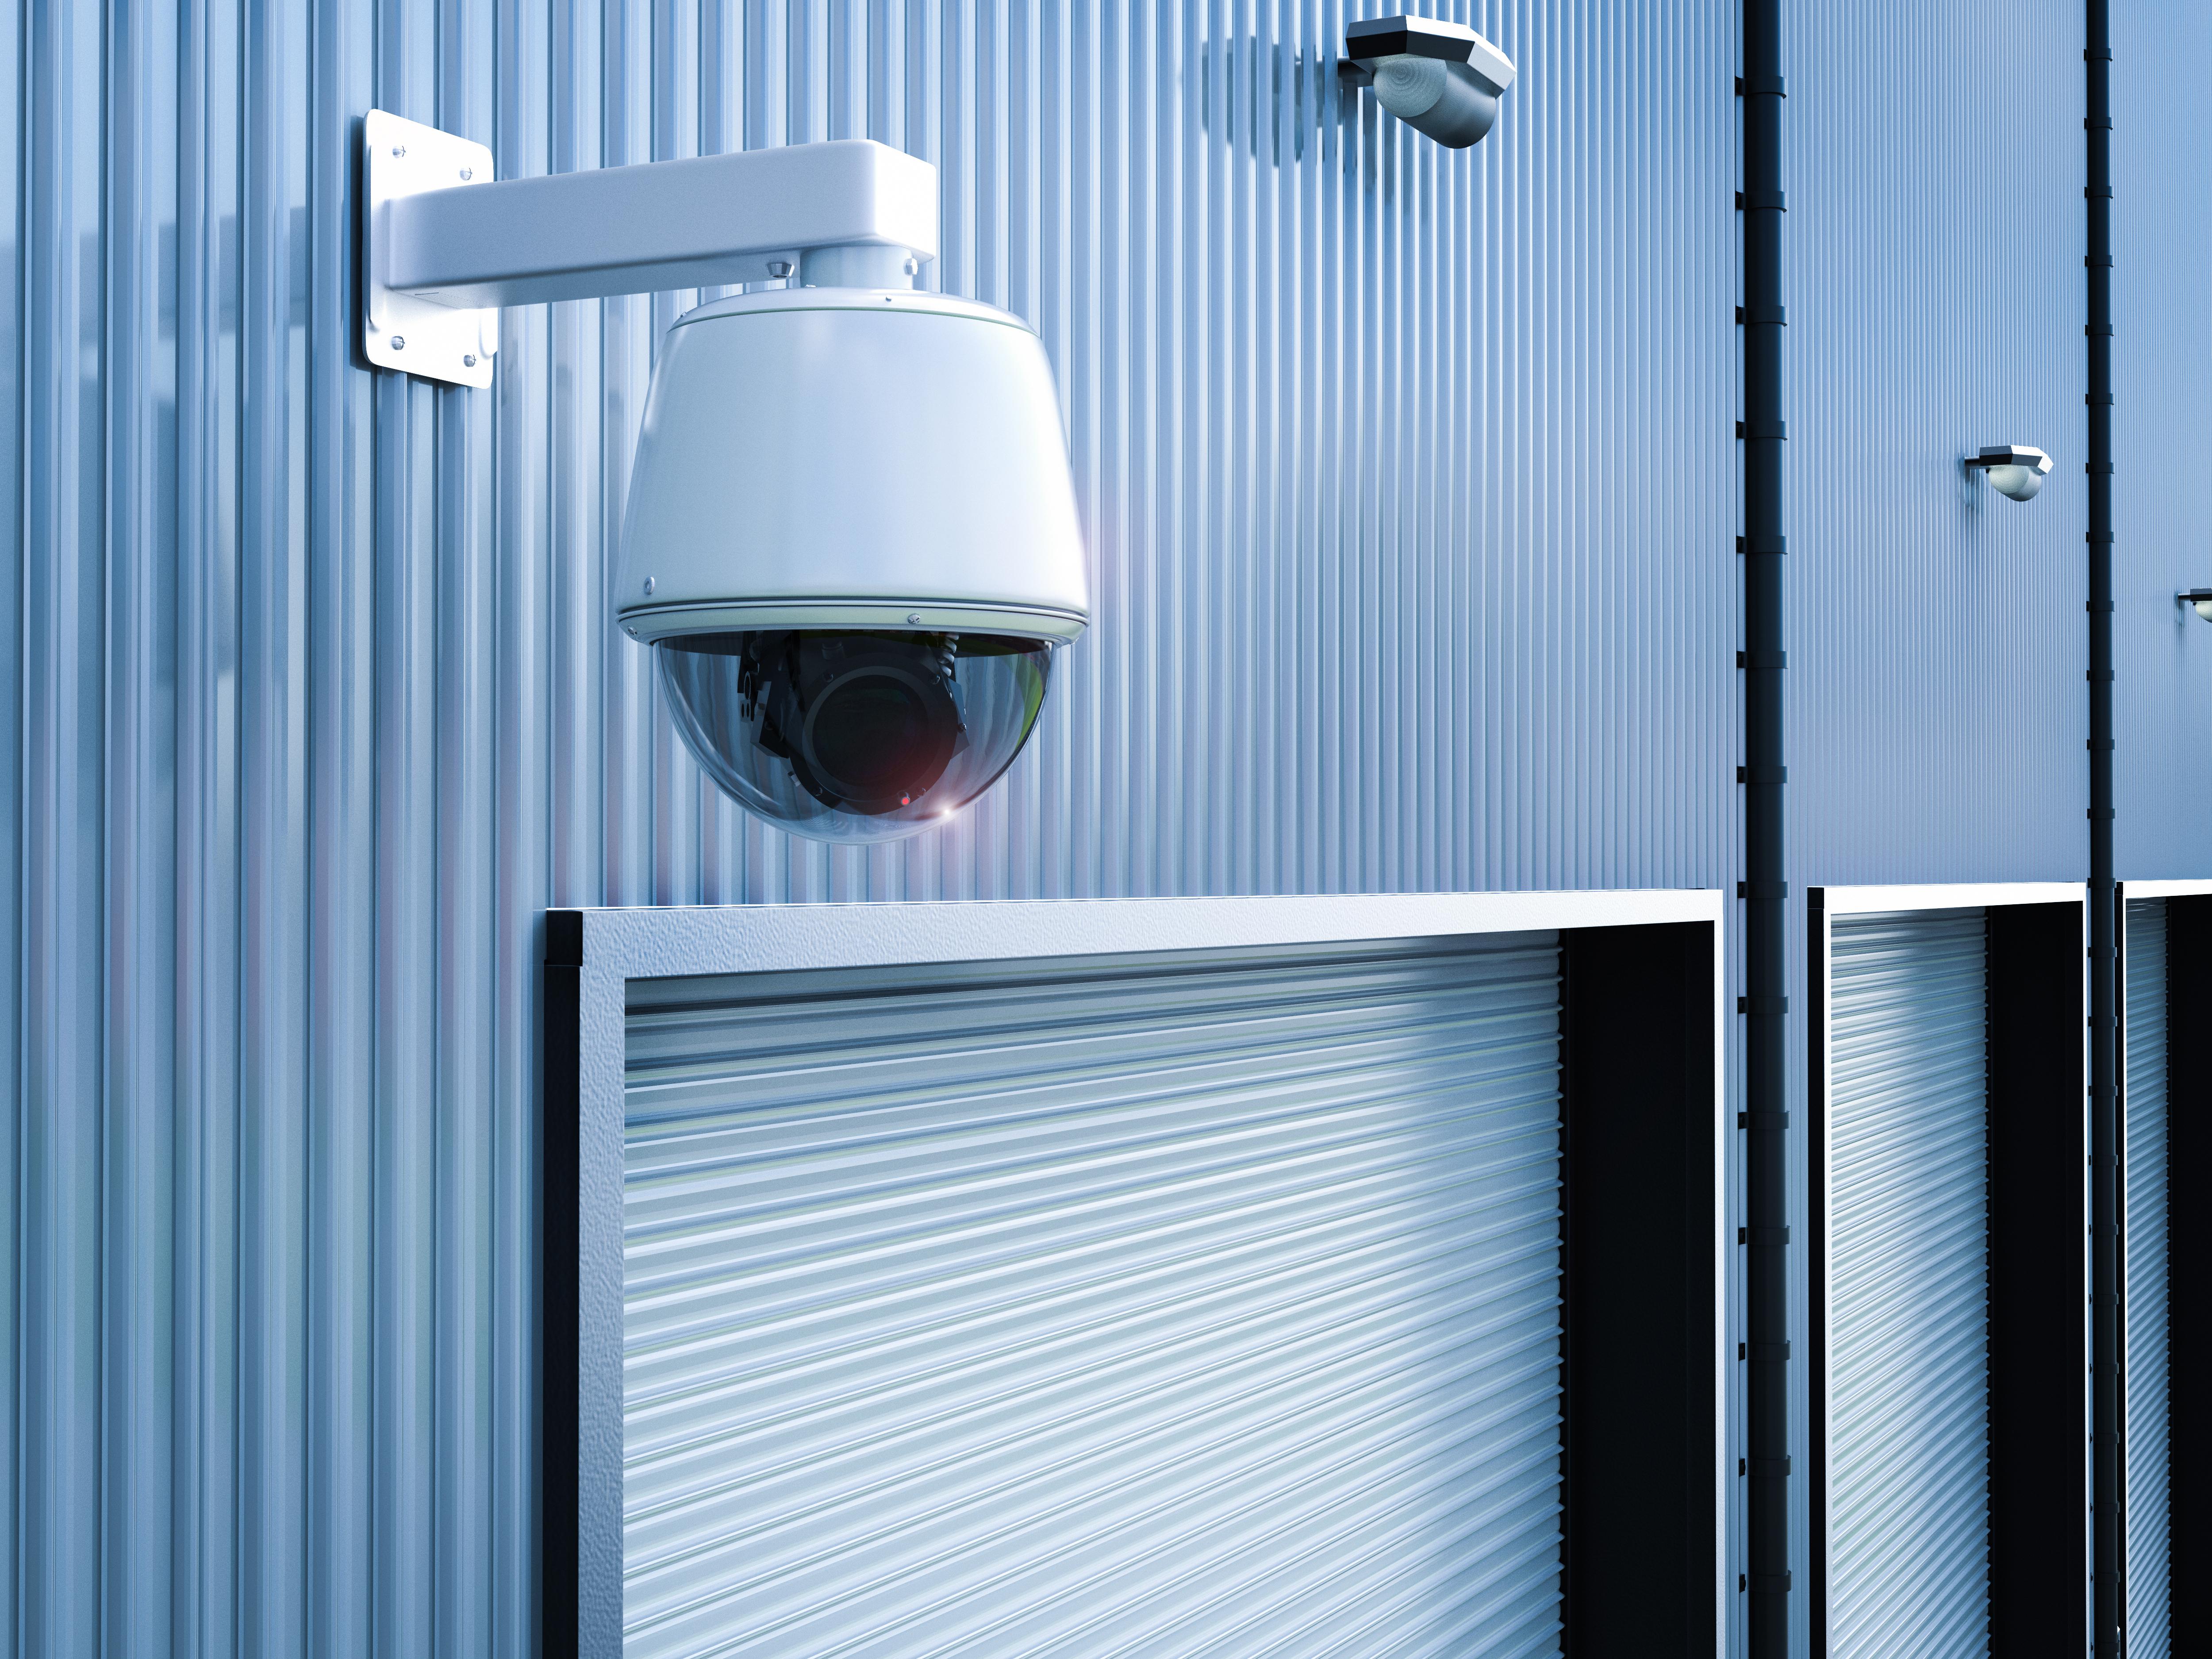 Warehouse CCTV Security Camera